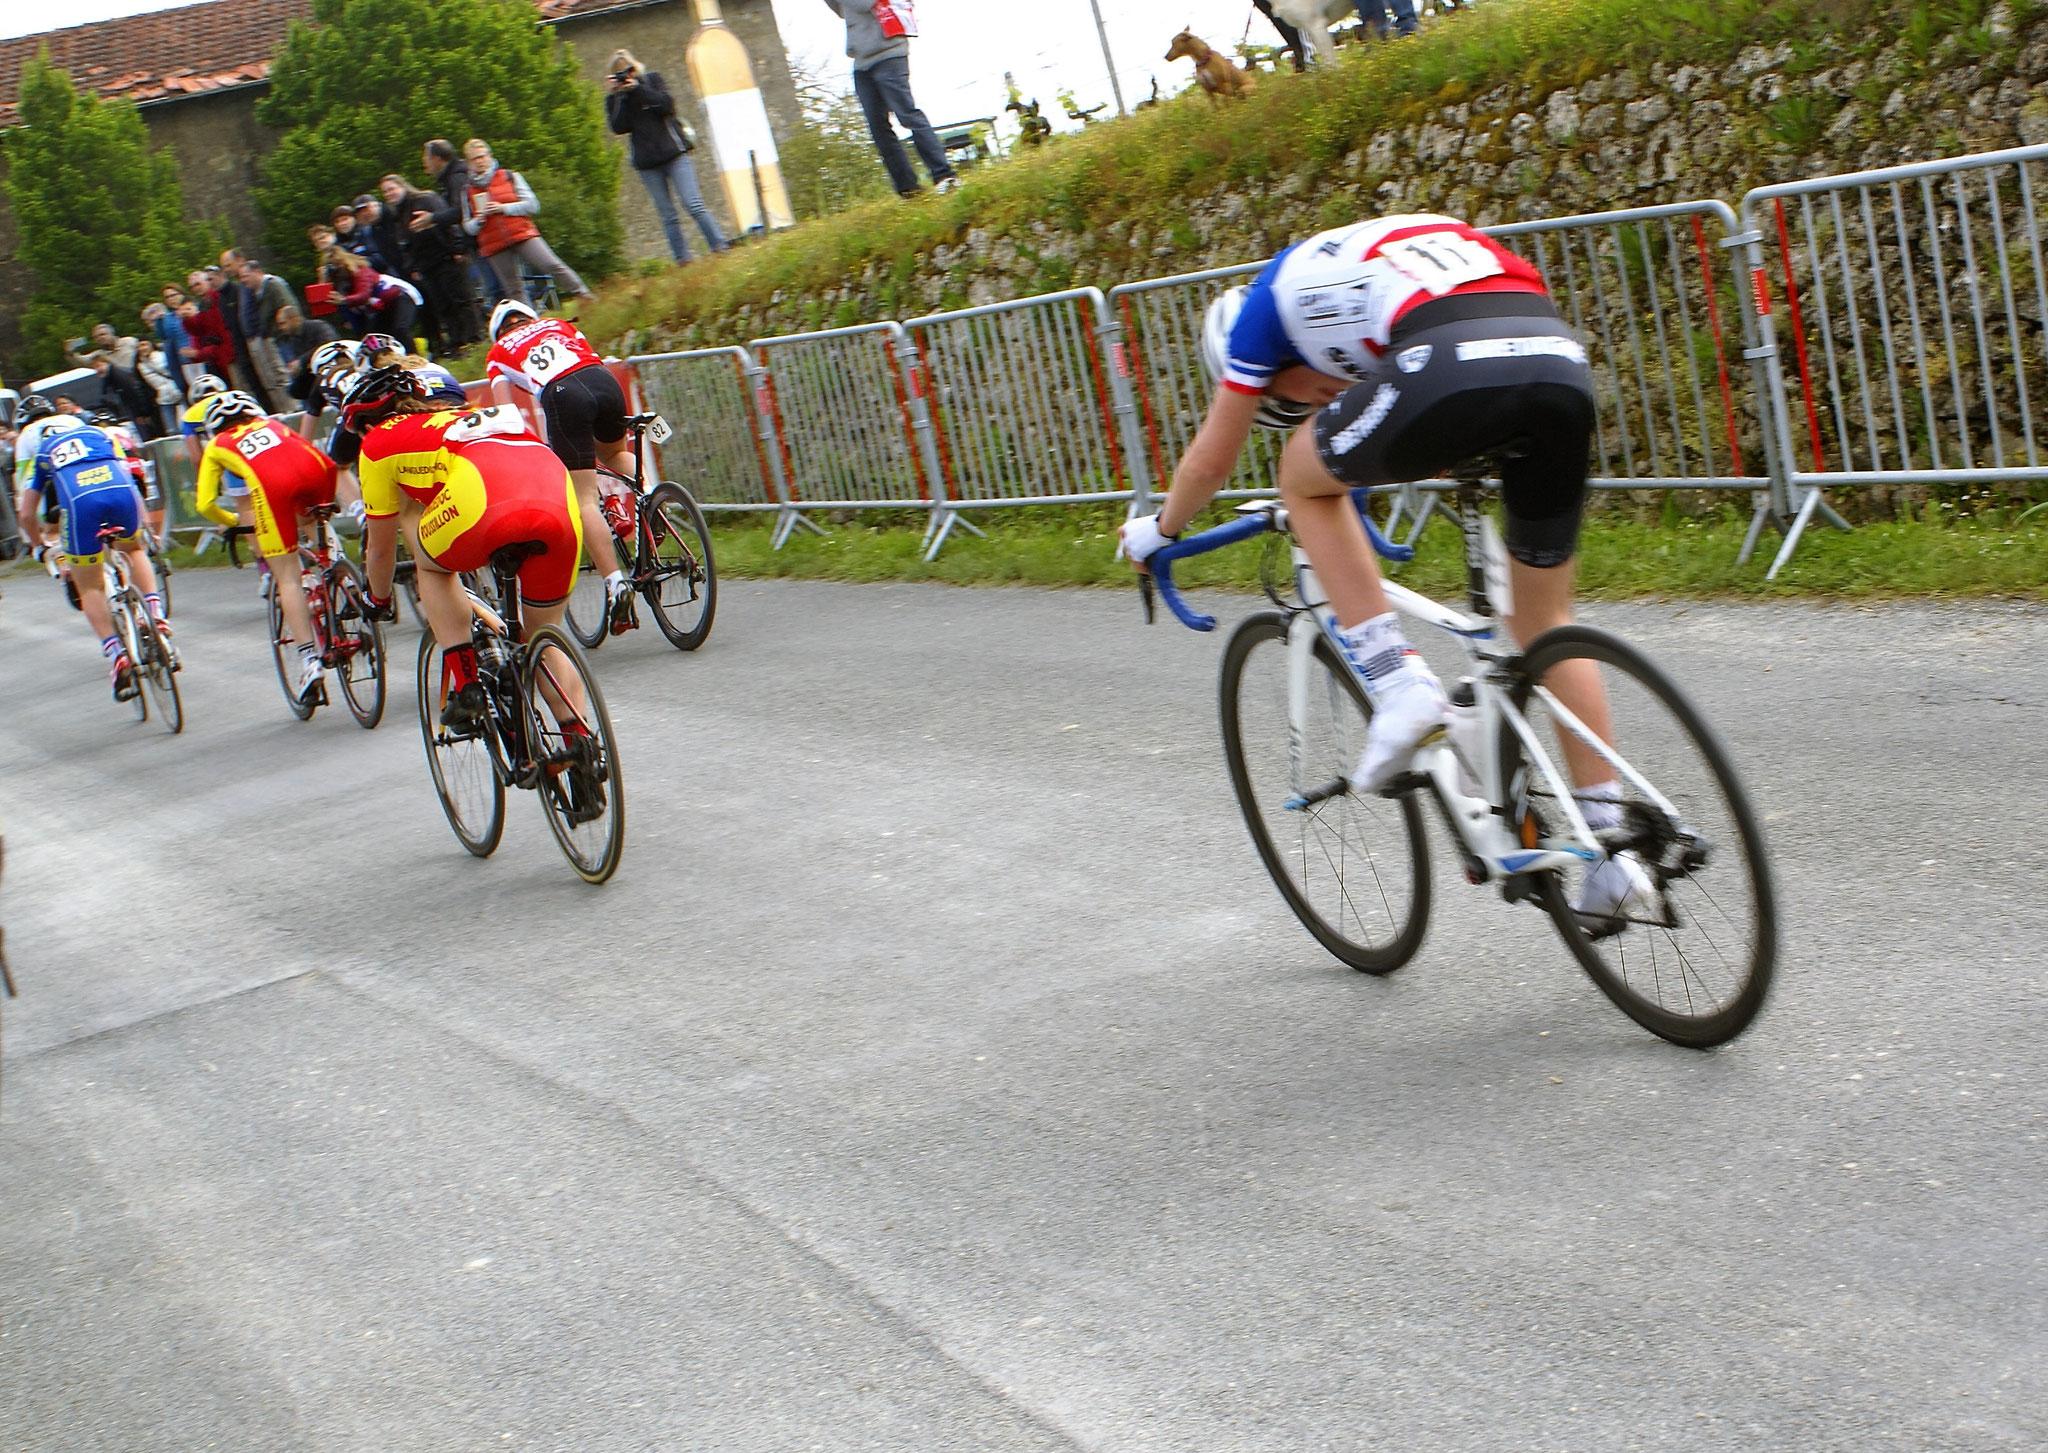 Célia en plein effort lors du sprint final